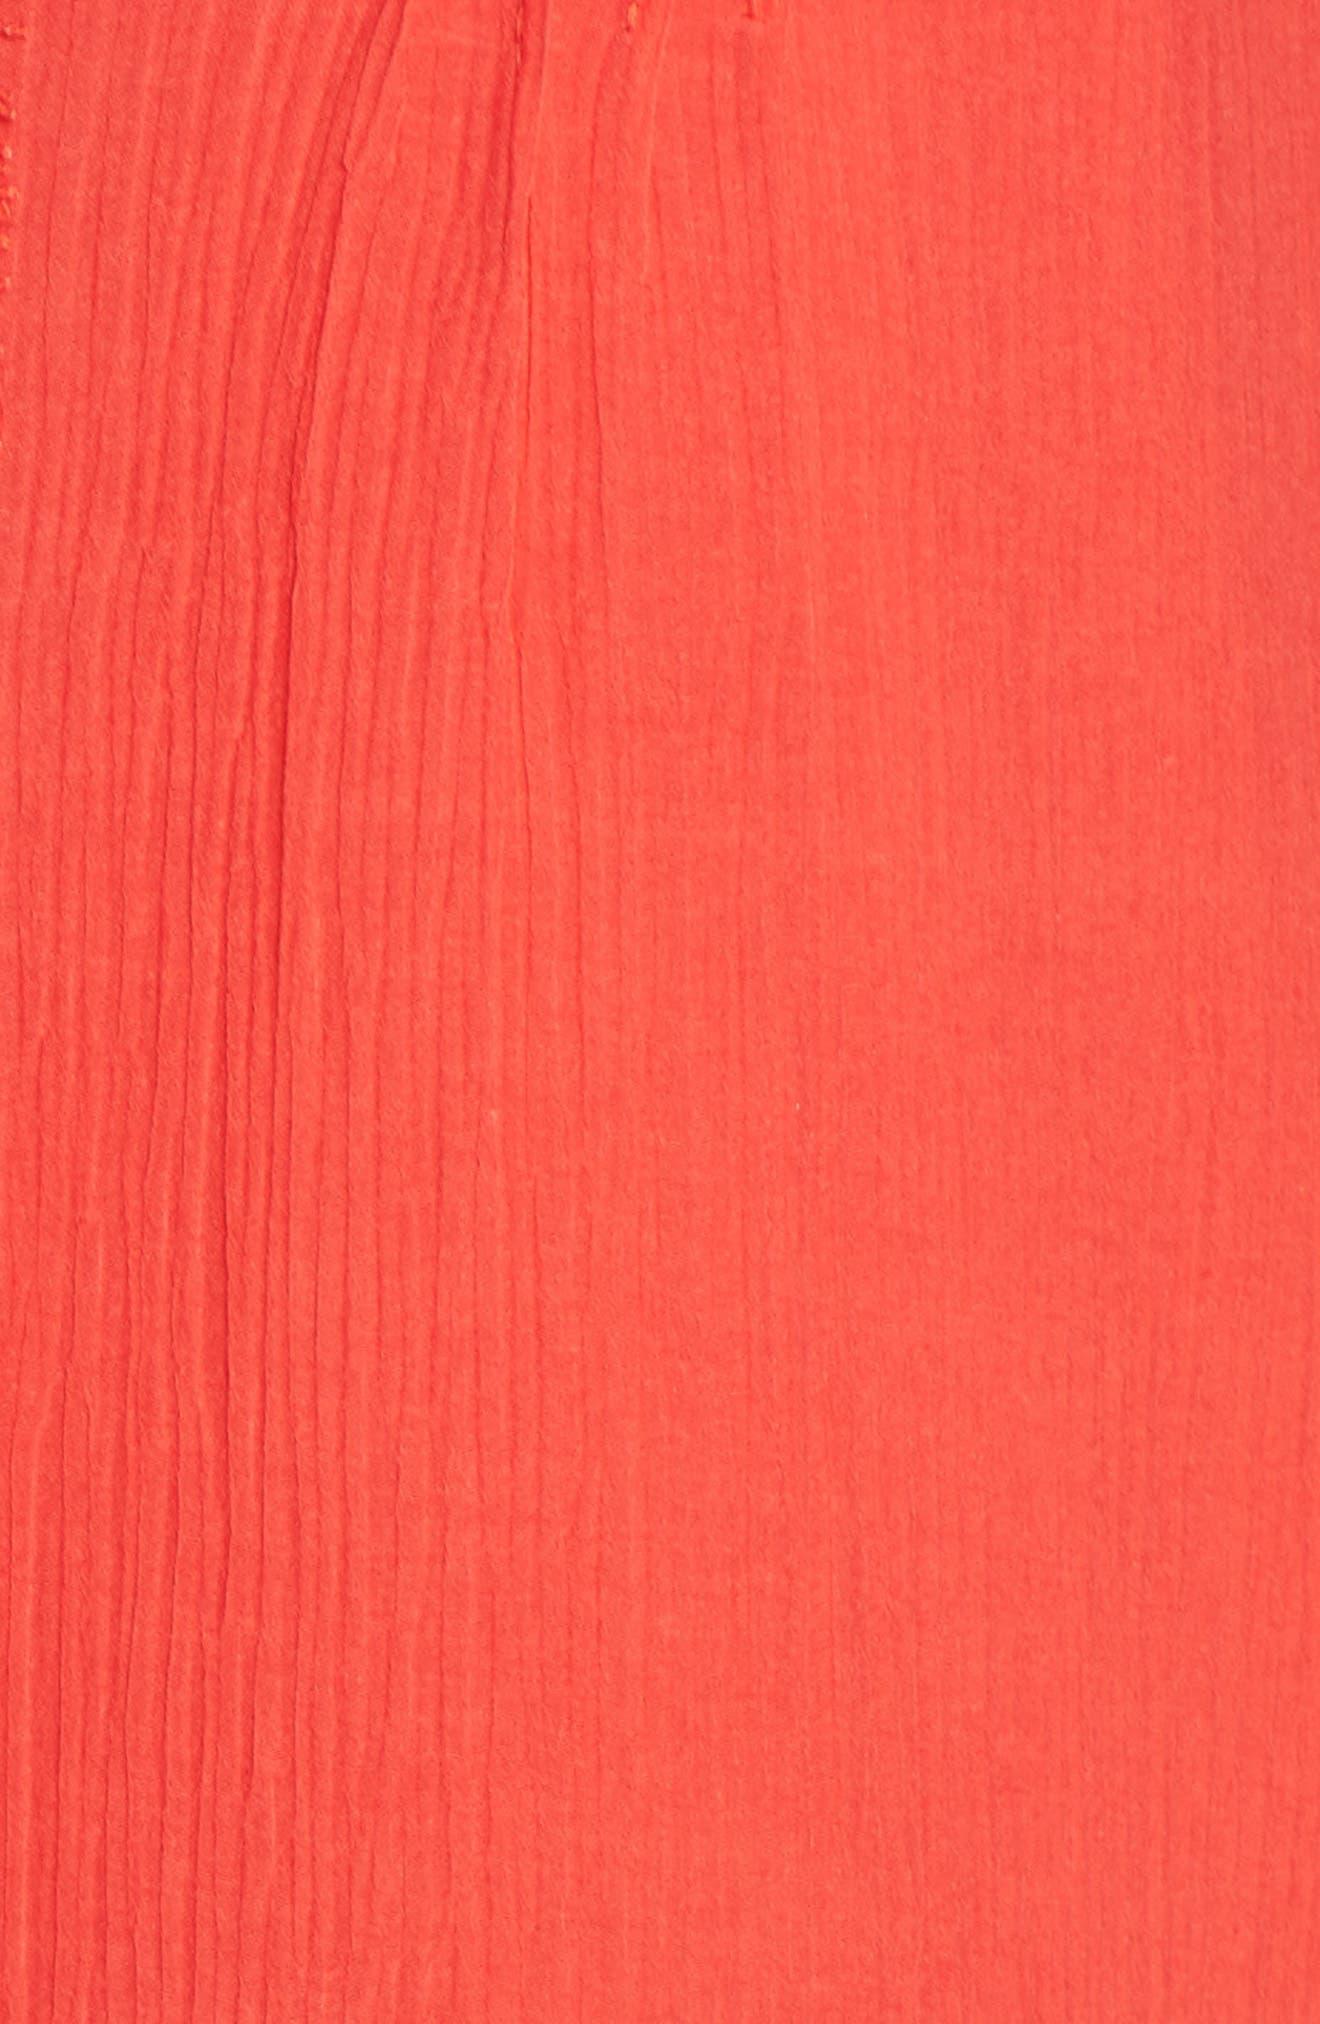 Mala Crinkle Shift Dress,                             Alternate thumbnail 6, color,                             Strawberry